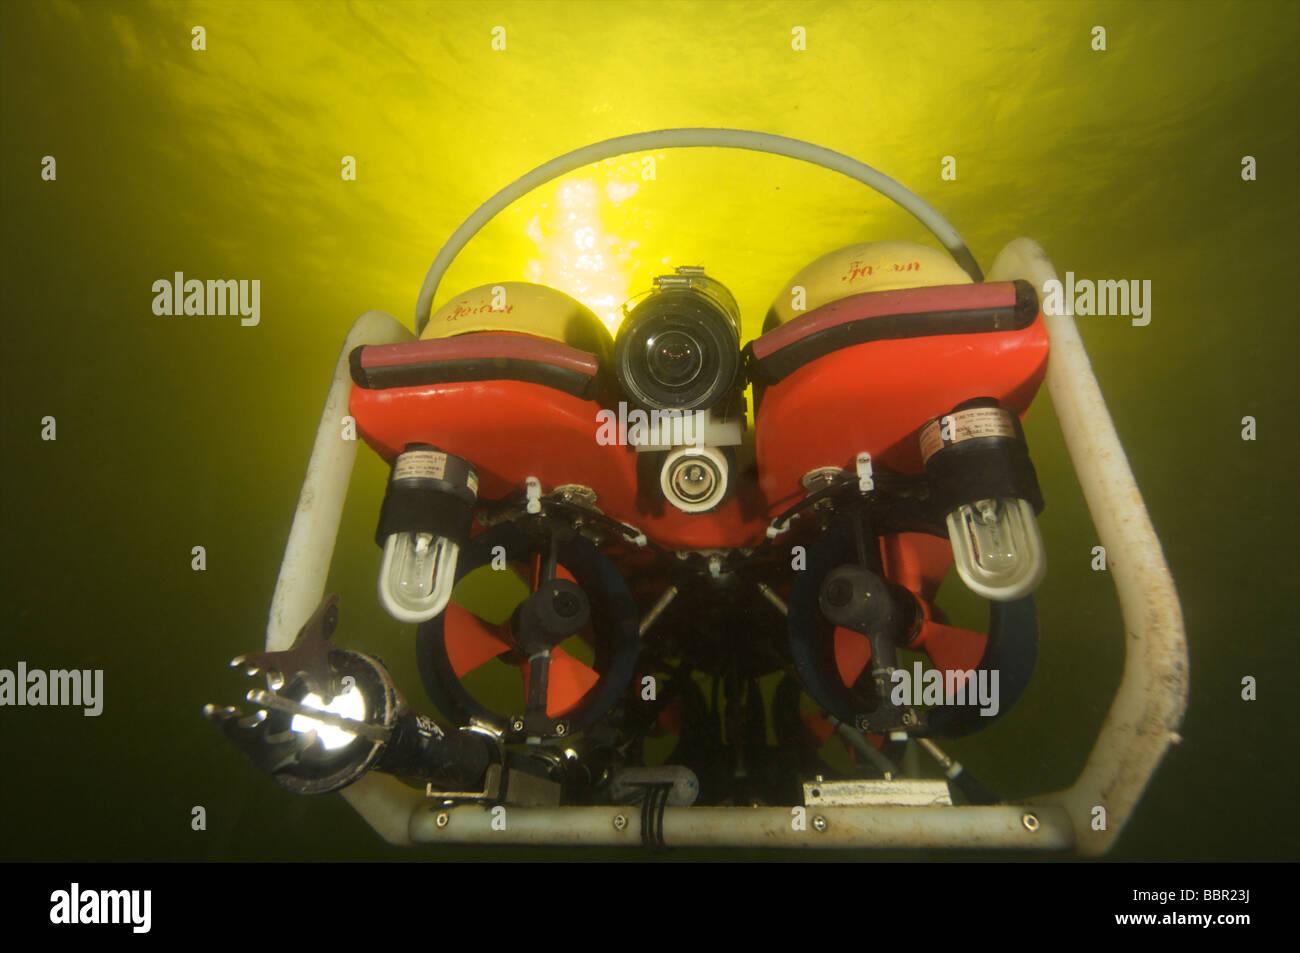 ROV or robotic underwater vechile working underwater Stock Photo